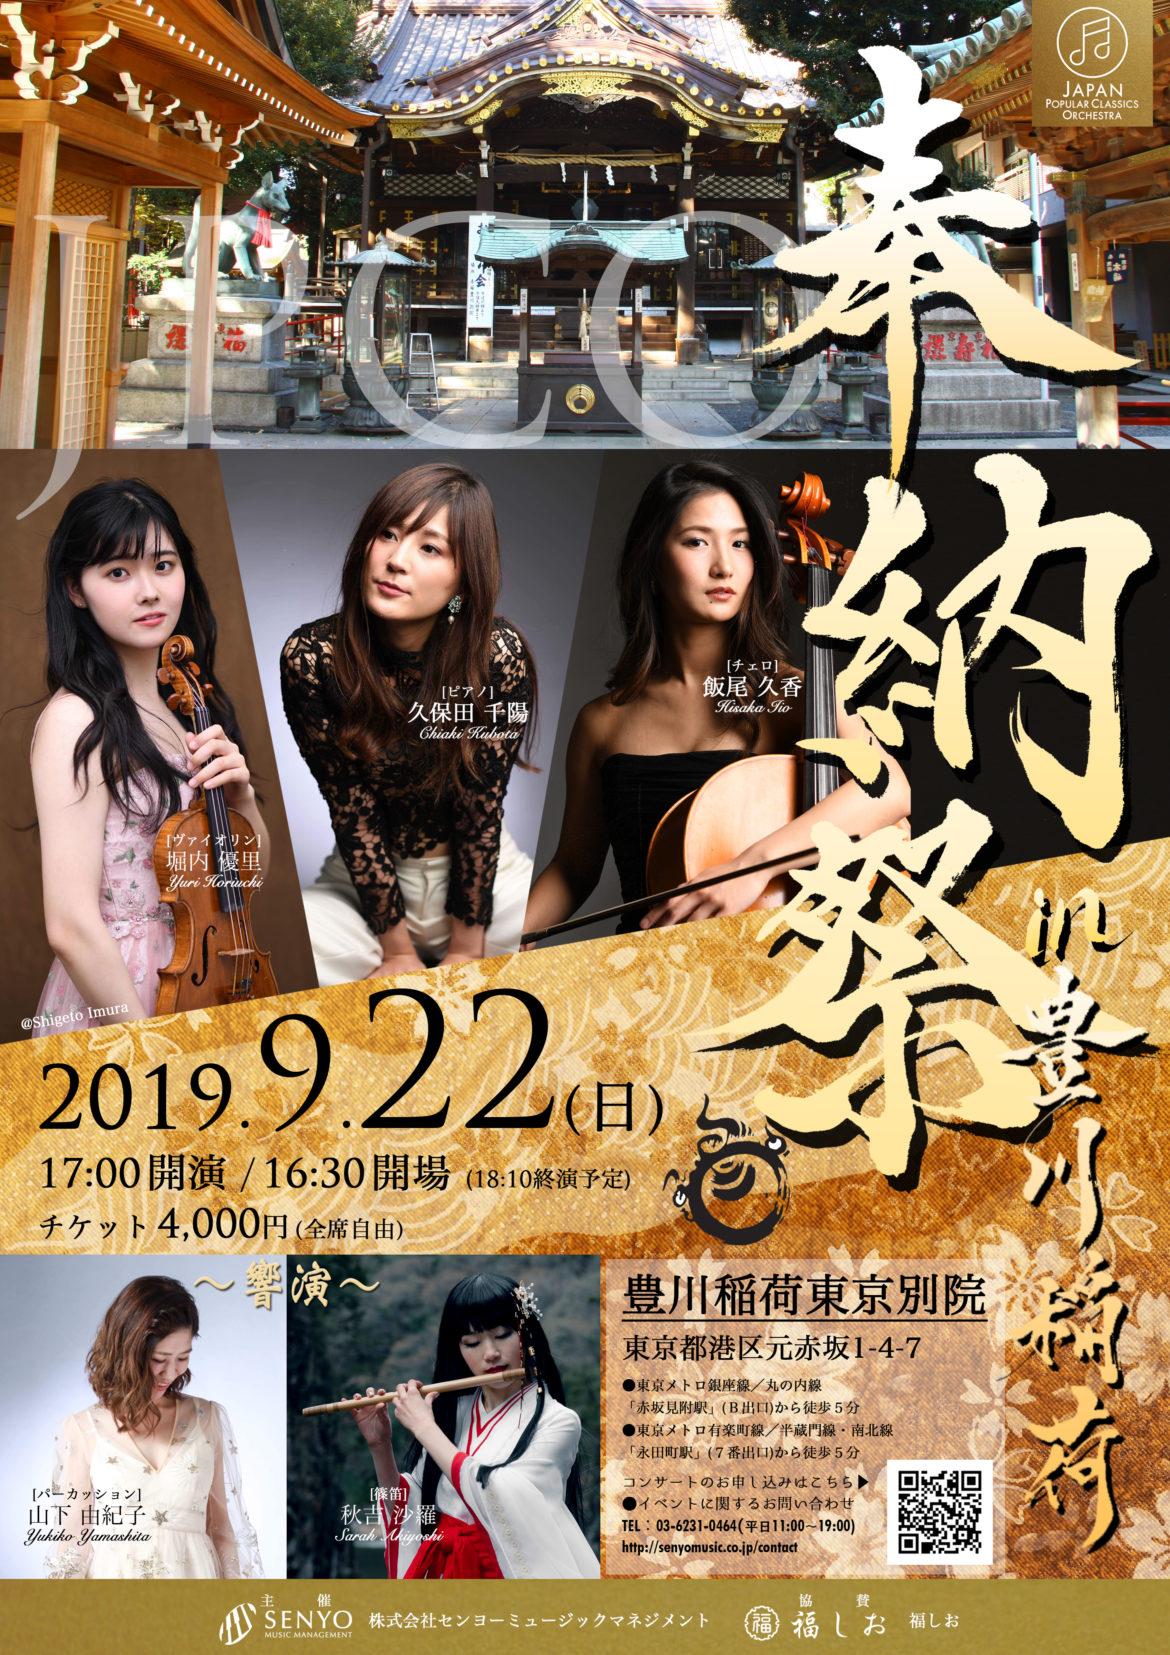 2019.9.22 『JPCO 奉納祭  〜in 豊川稲荷〜  』